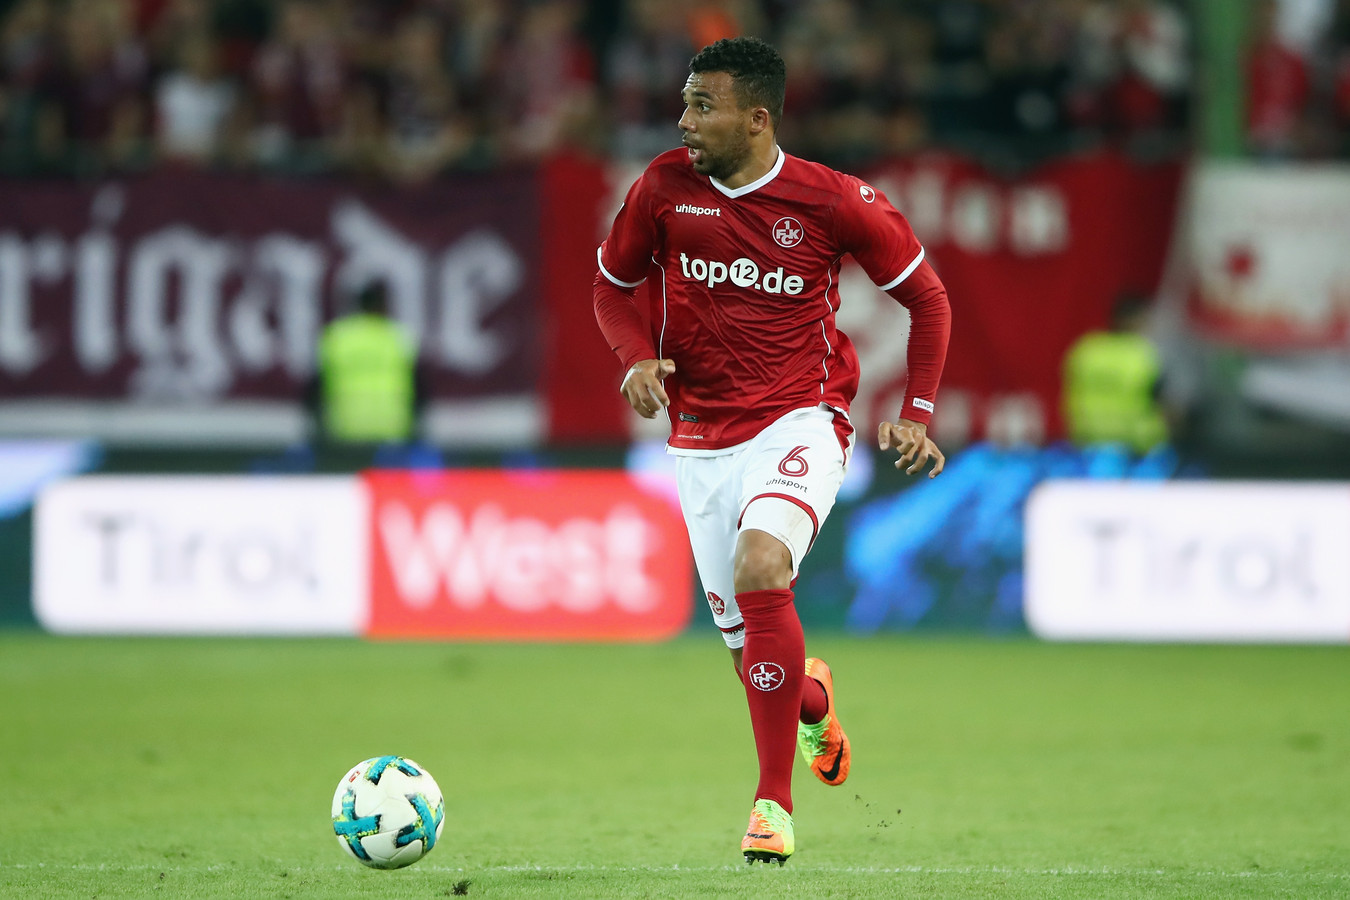 Leon Guwara in actie namens Kaiserslautern.